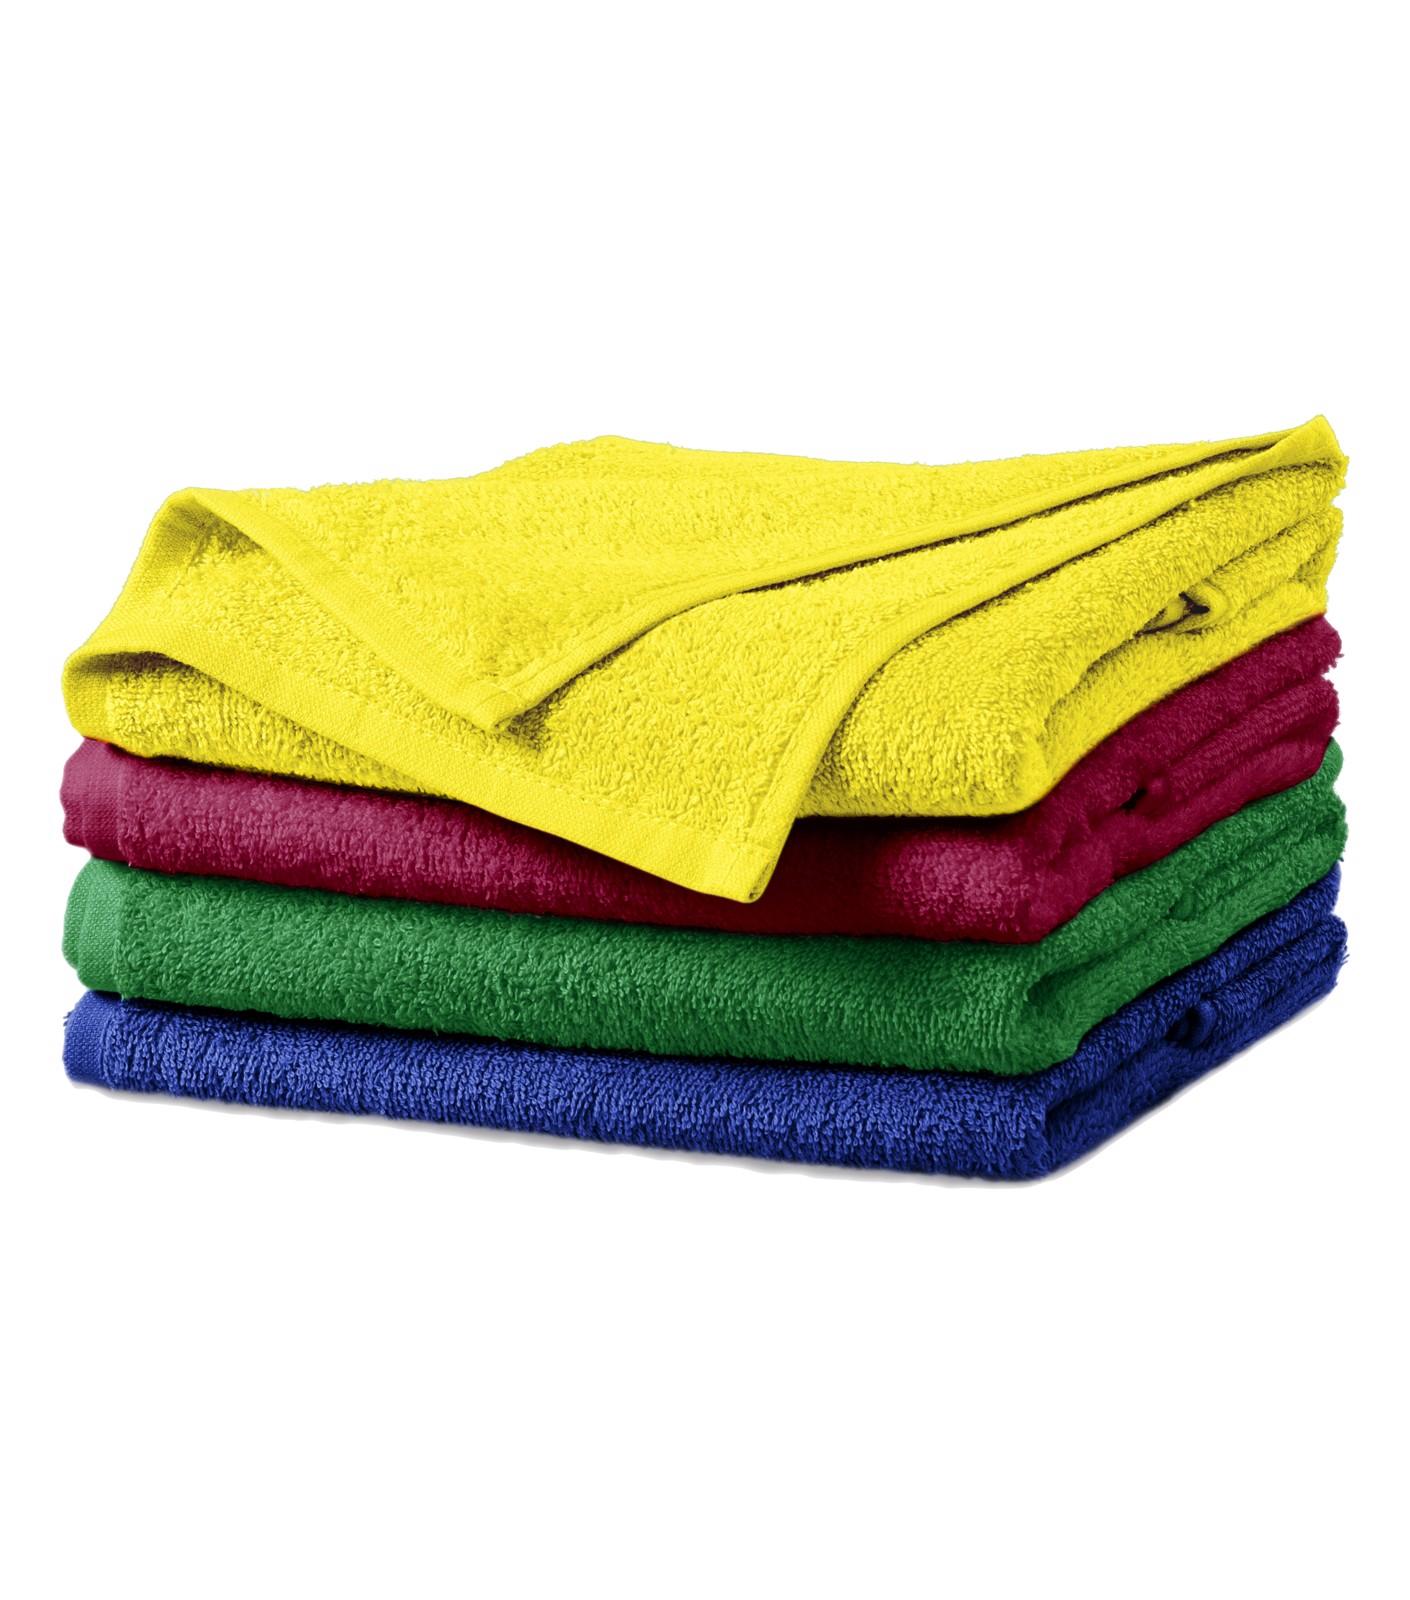 Ručník unisex Malfini Terry Towel - Citronová / 50 x 100 cm